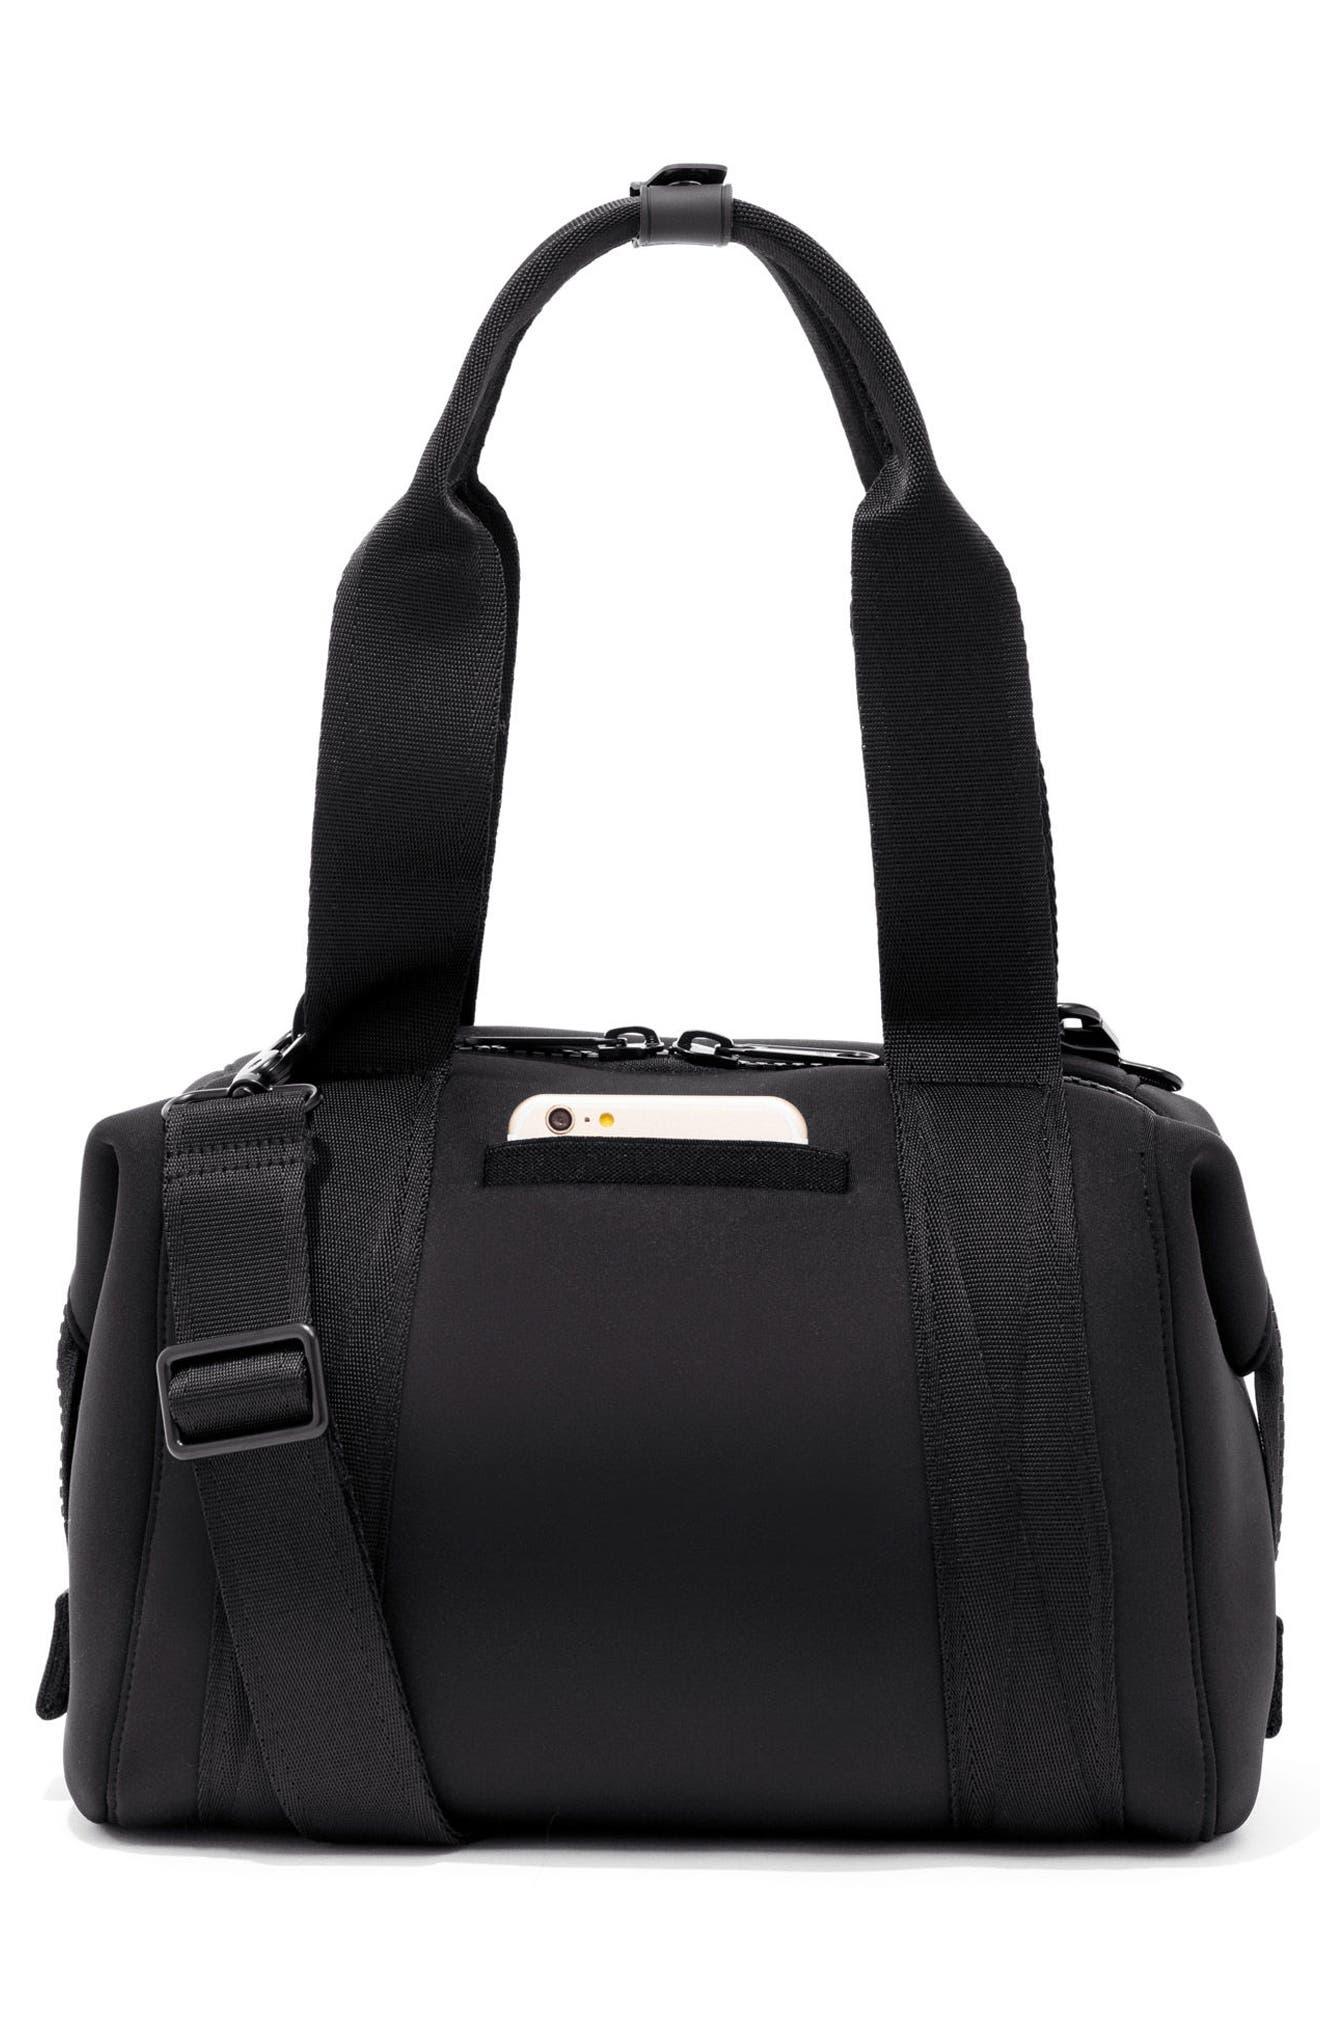 DAGNE DOVER, 365 Small Landon Carryall Duffle Bag, Alternate thumbnail 2, color, ONYX